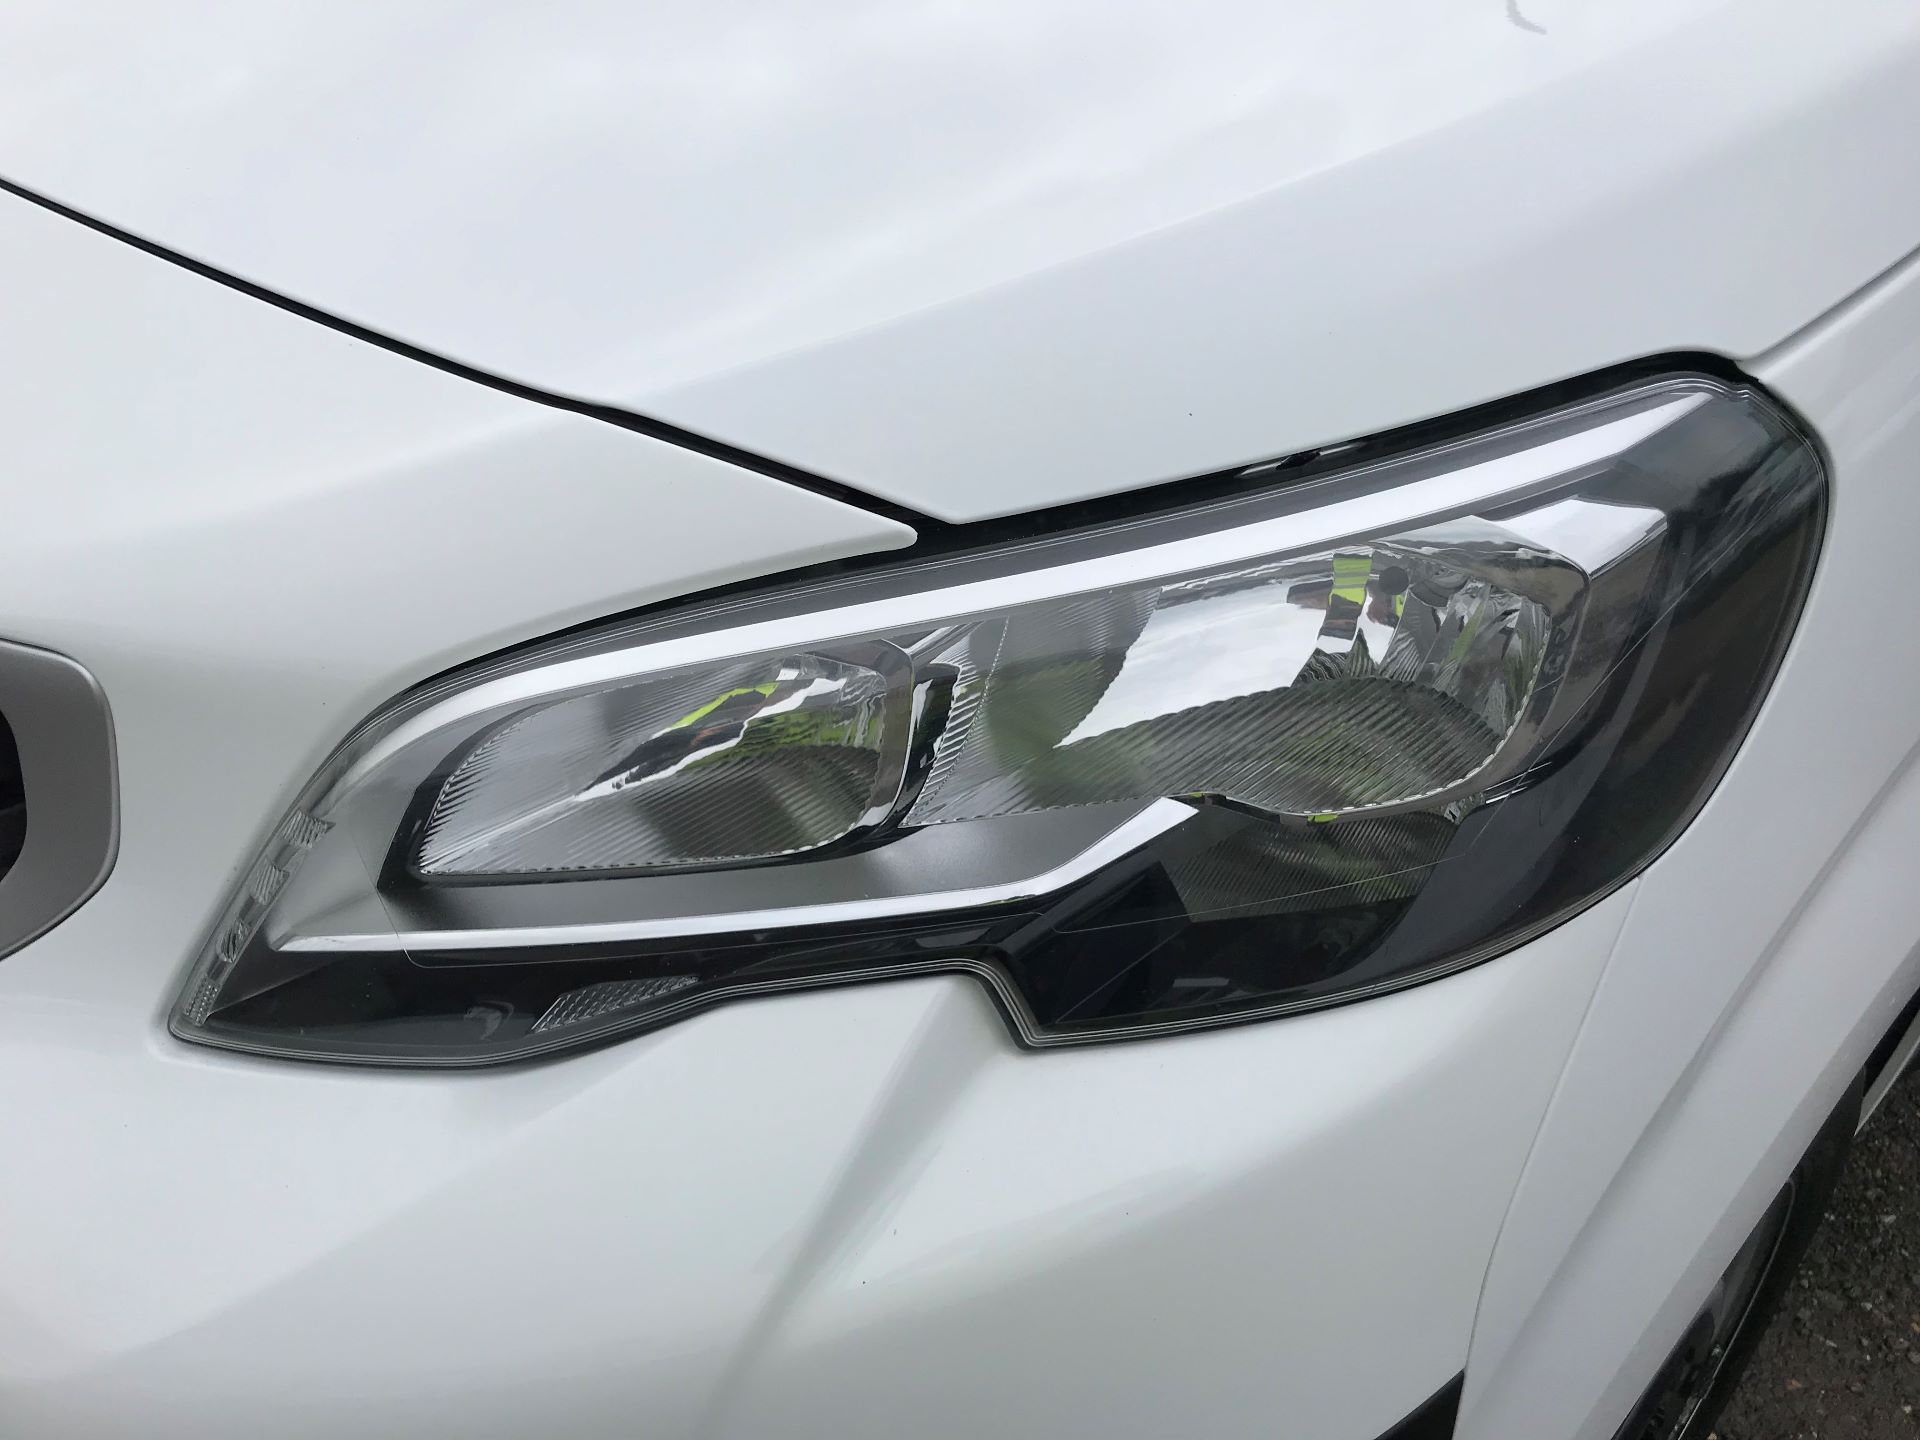 2018 Peugeot Expert STANDARD 1000 1.6 BLUEHDI 95 PROFESSIONAL EURO 6 (NU18VXL) Image 31